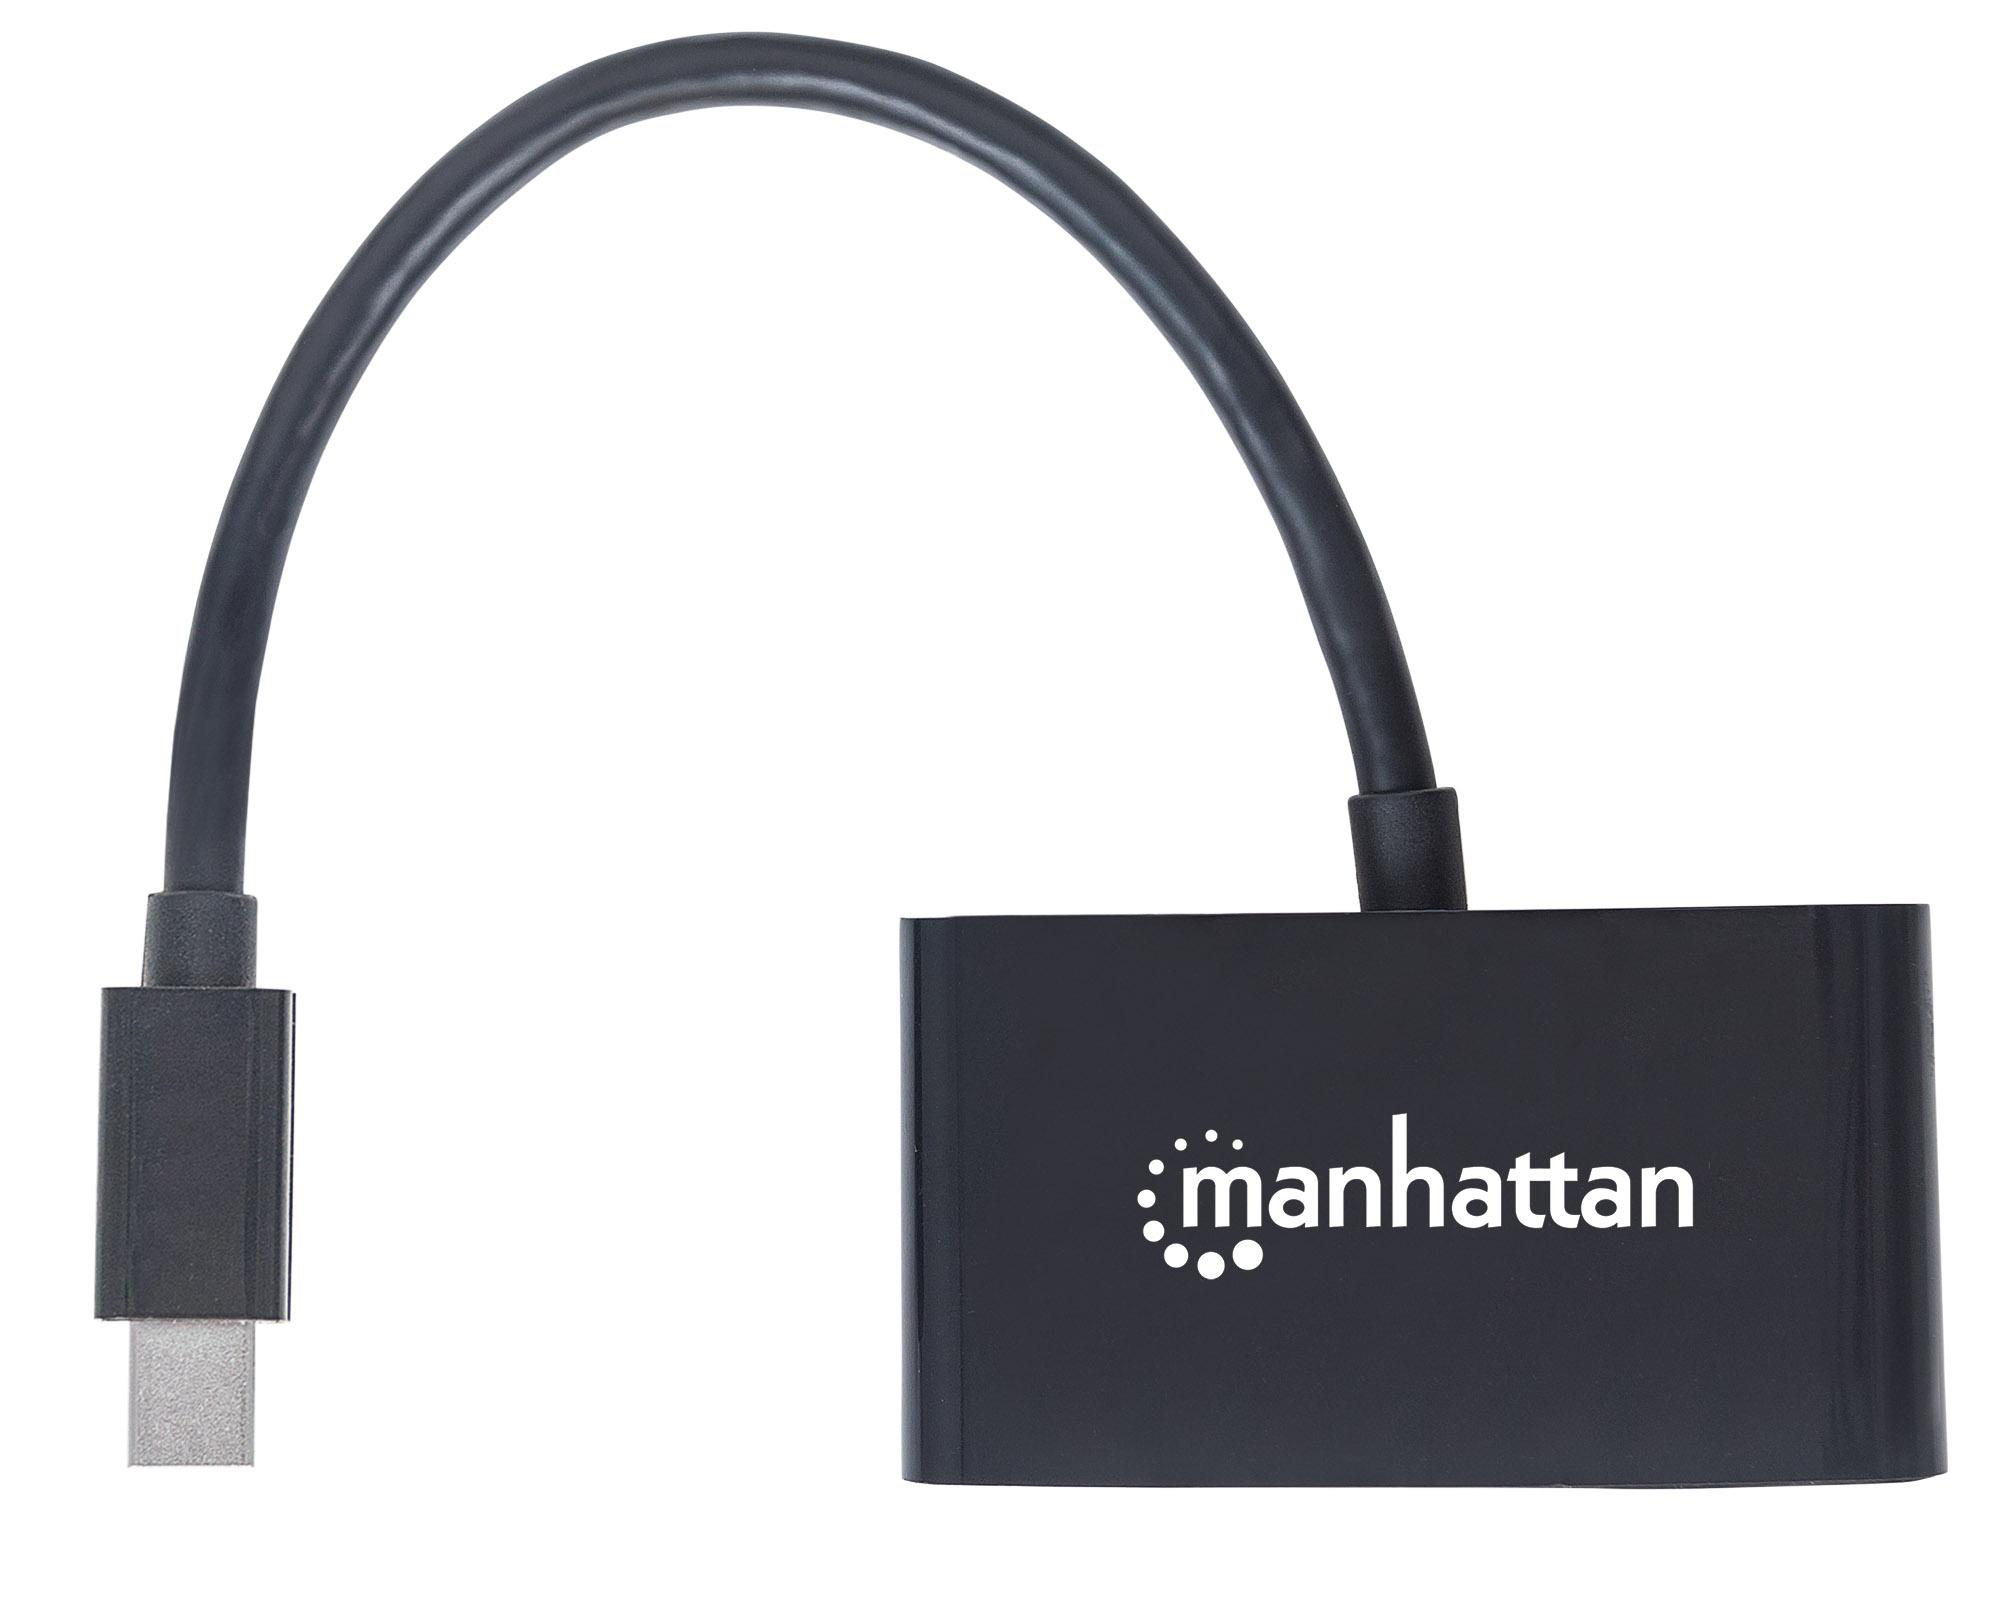 2-in-1 4K Mini DisplayPort Adapter